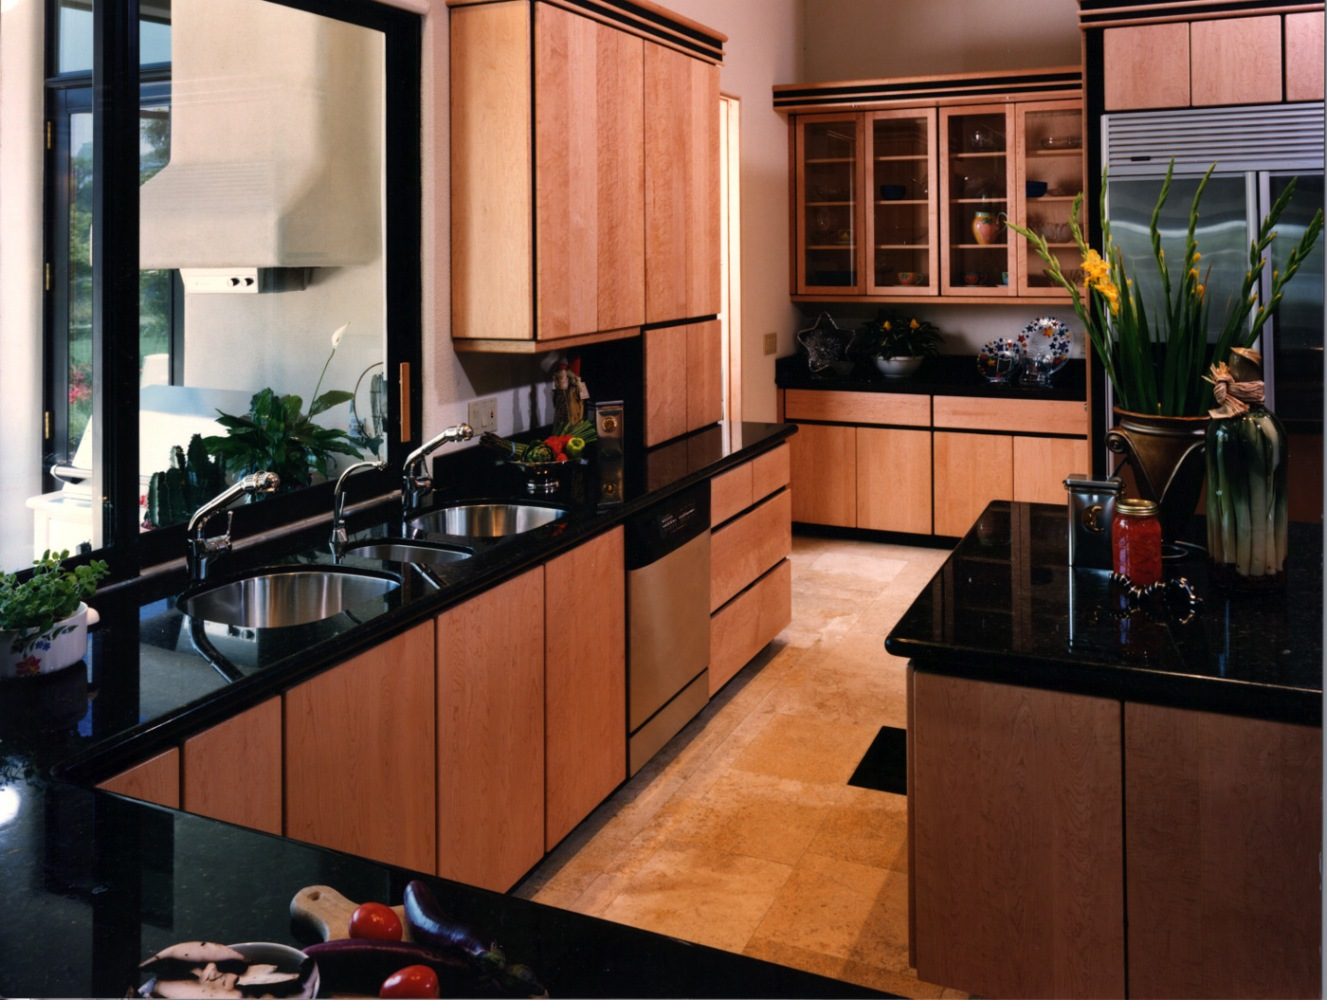 5500-Isleworth-Country-Club-Drive-Kitchen-2-65.jpg